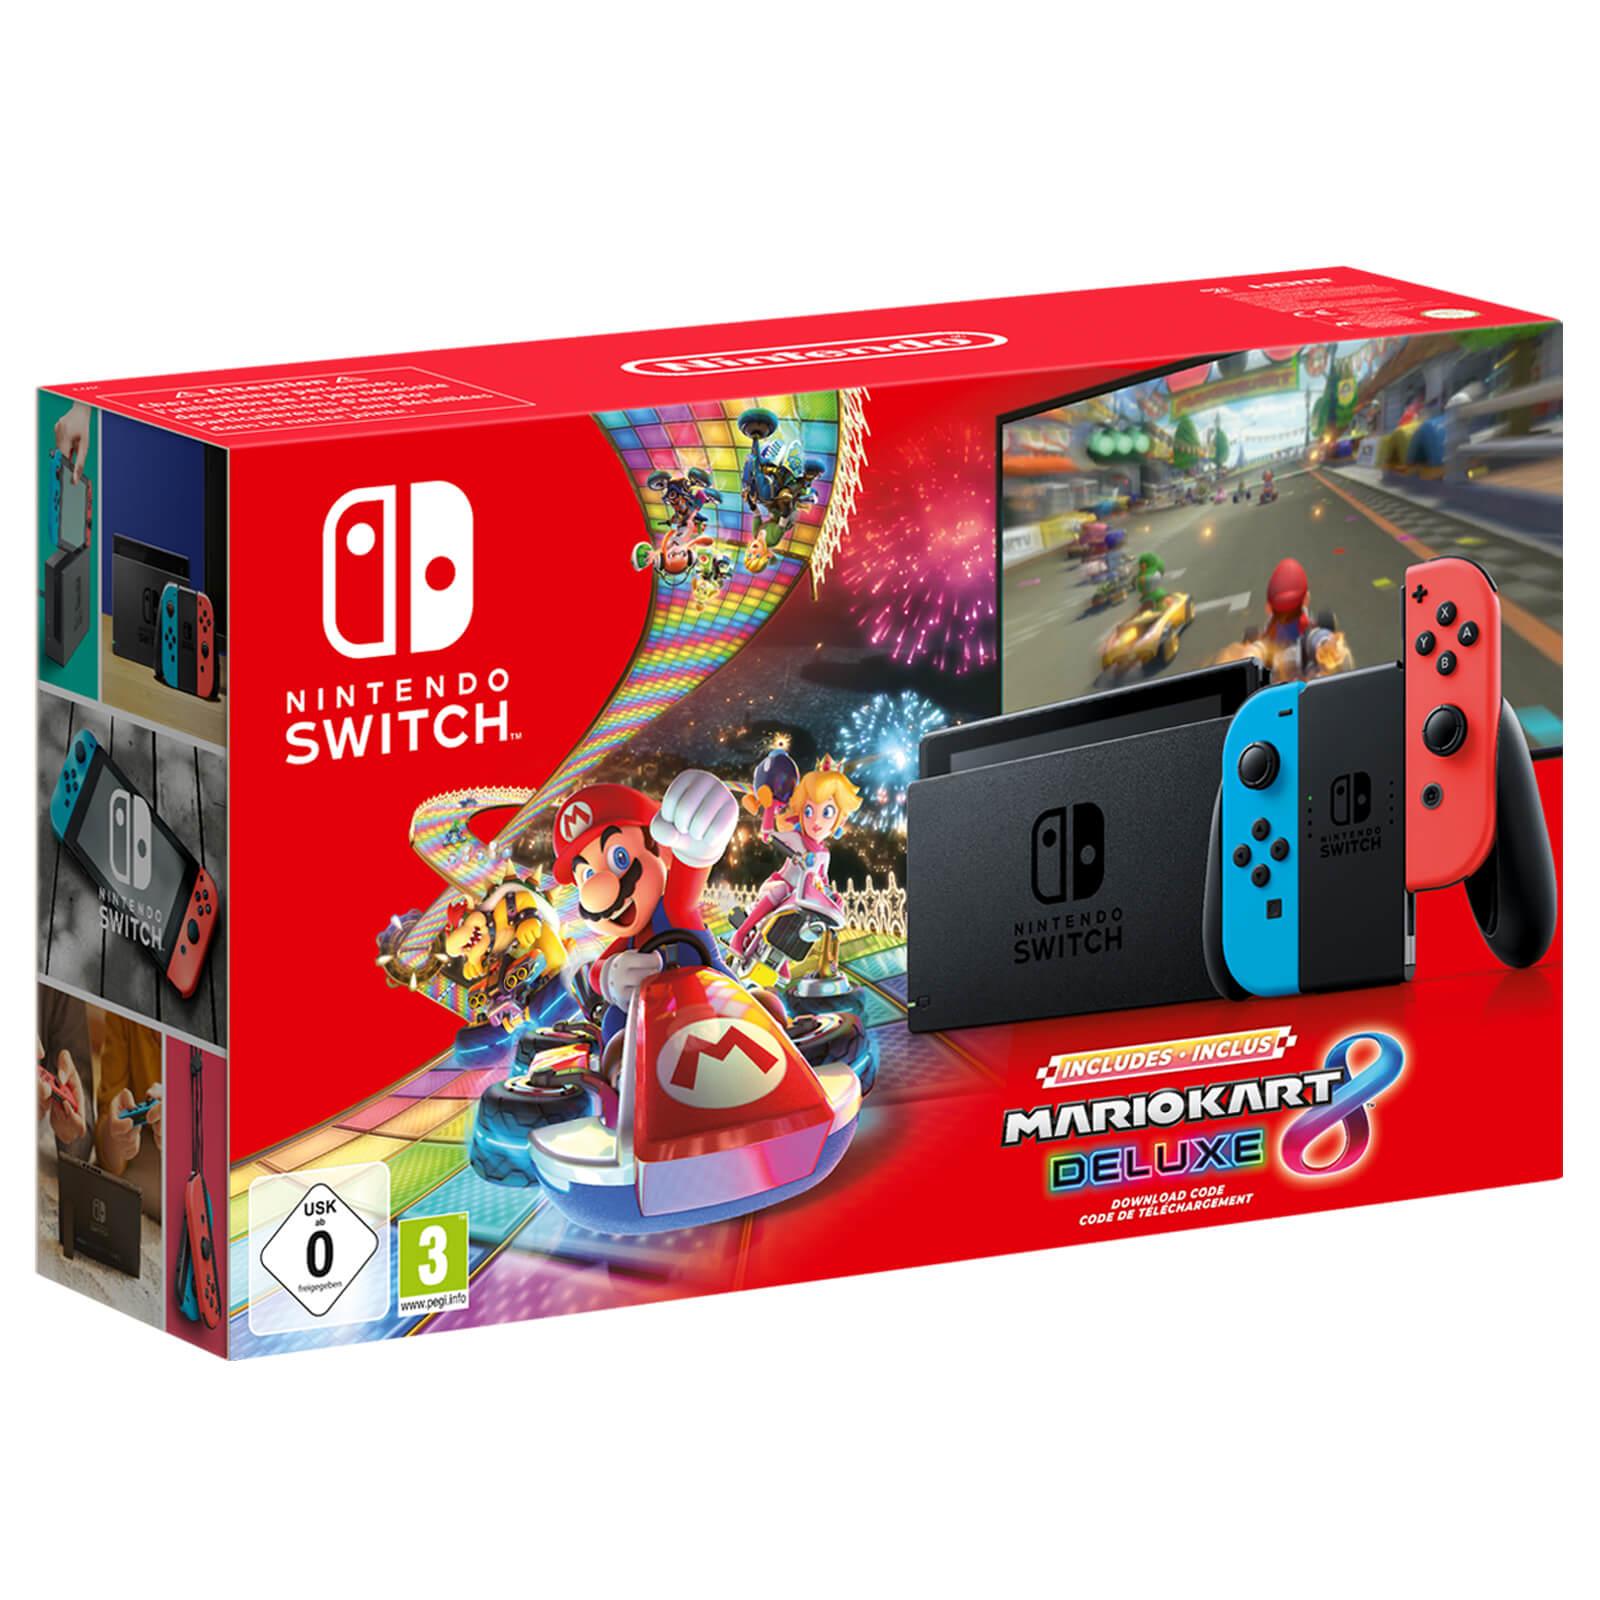 Nintendo Selling Mario Kart 8 Switch Bundle With Improved